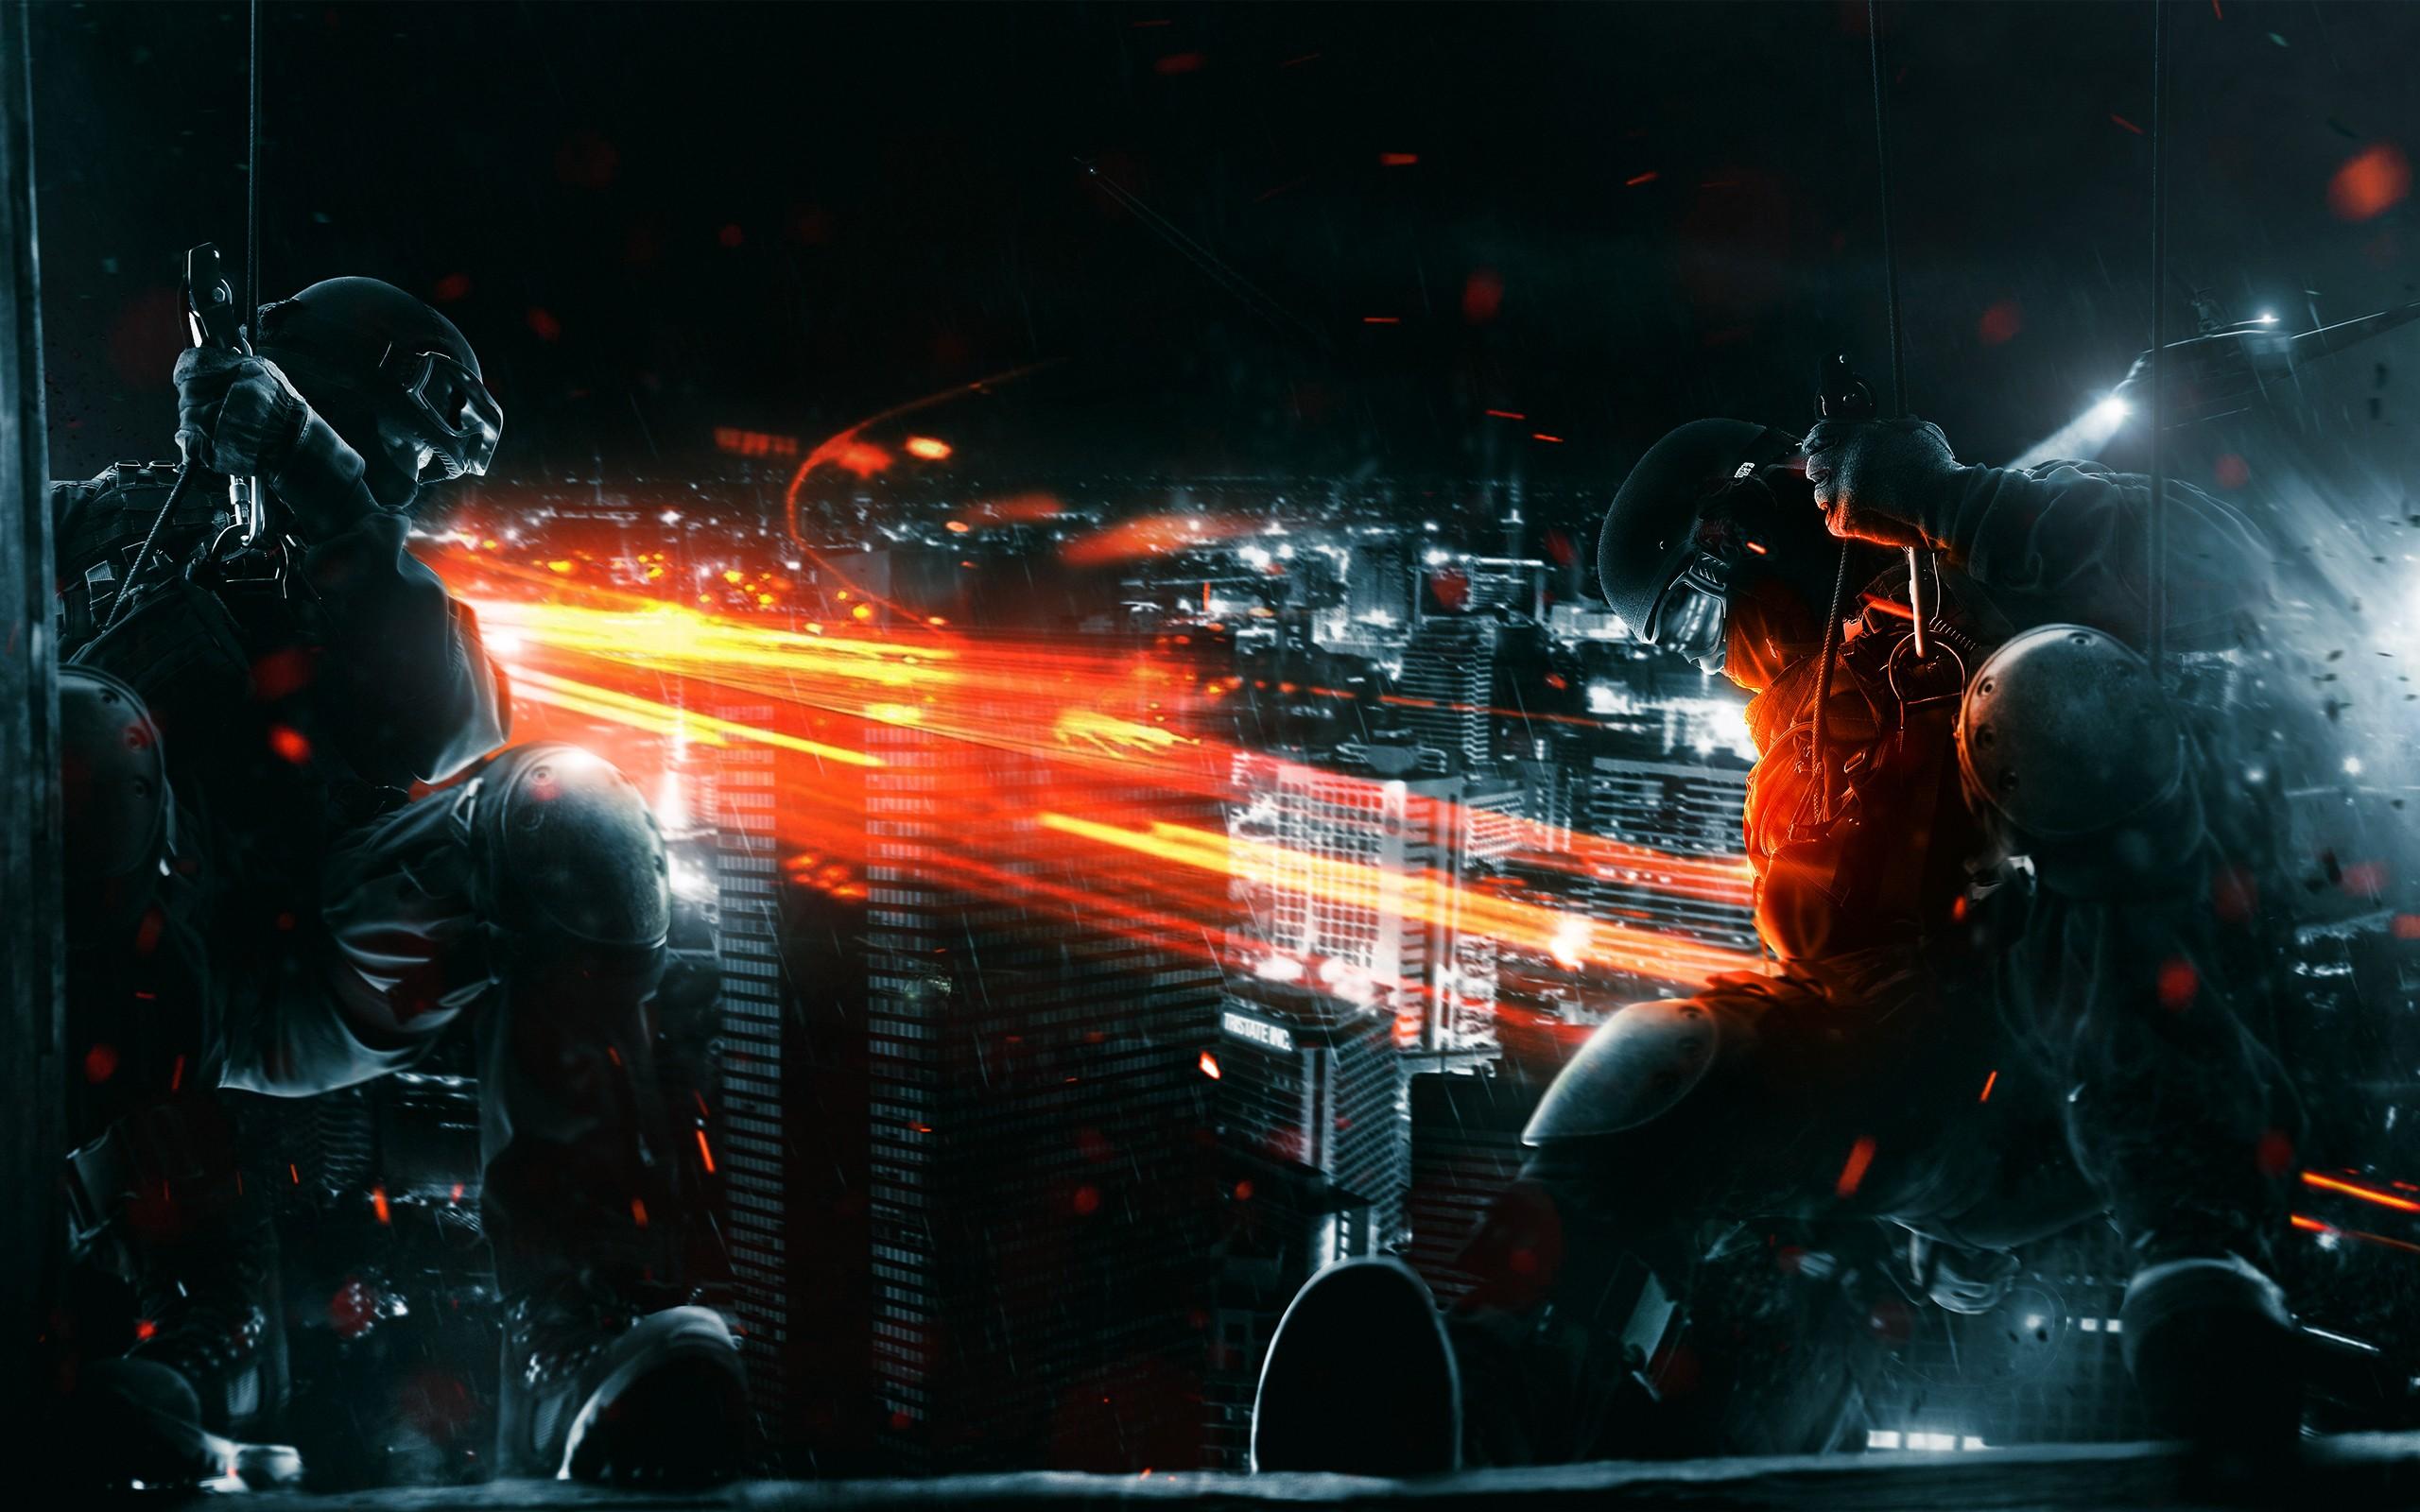 Battlefield 3 Spec Ops Wallpapers HD Wallpapers 2560x1600